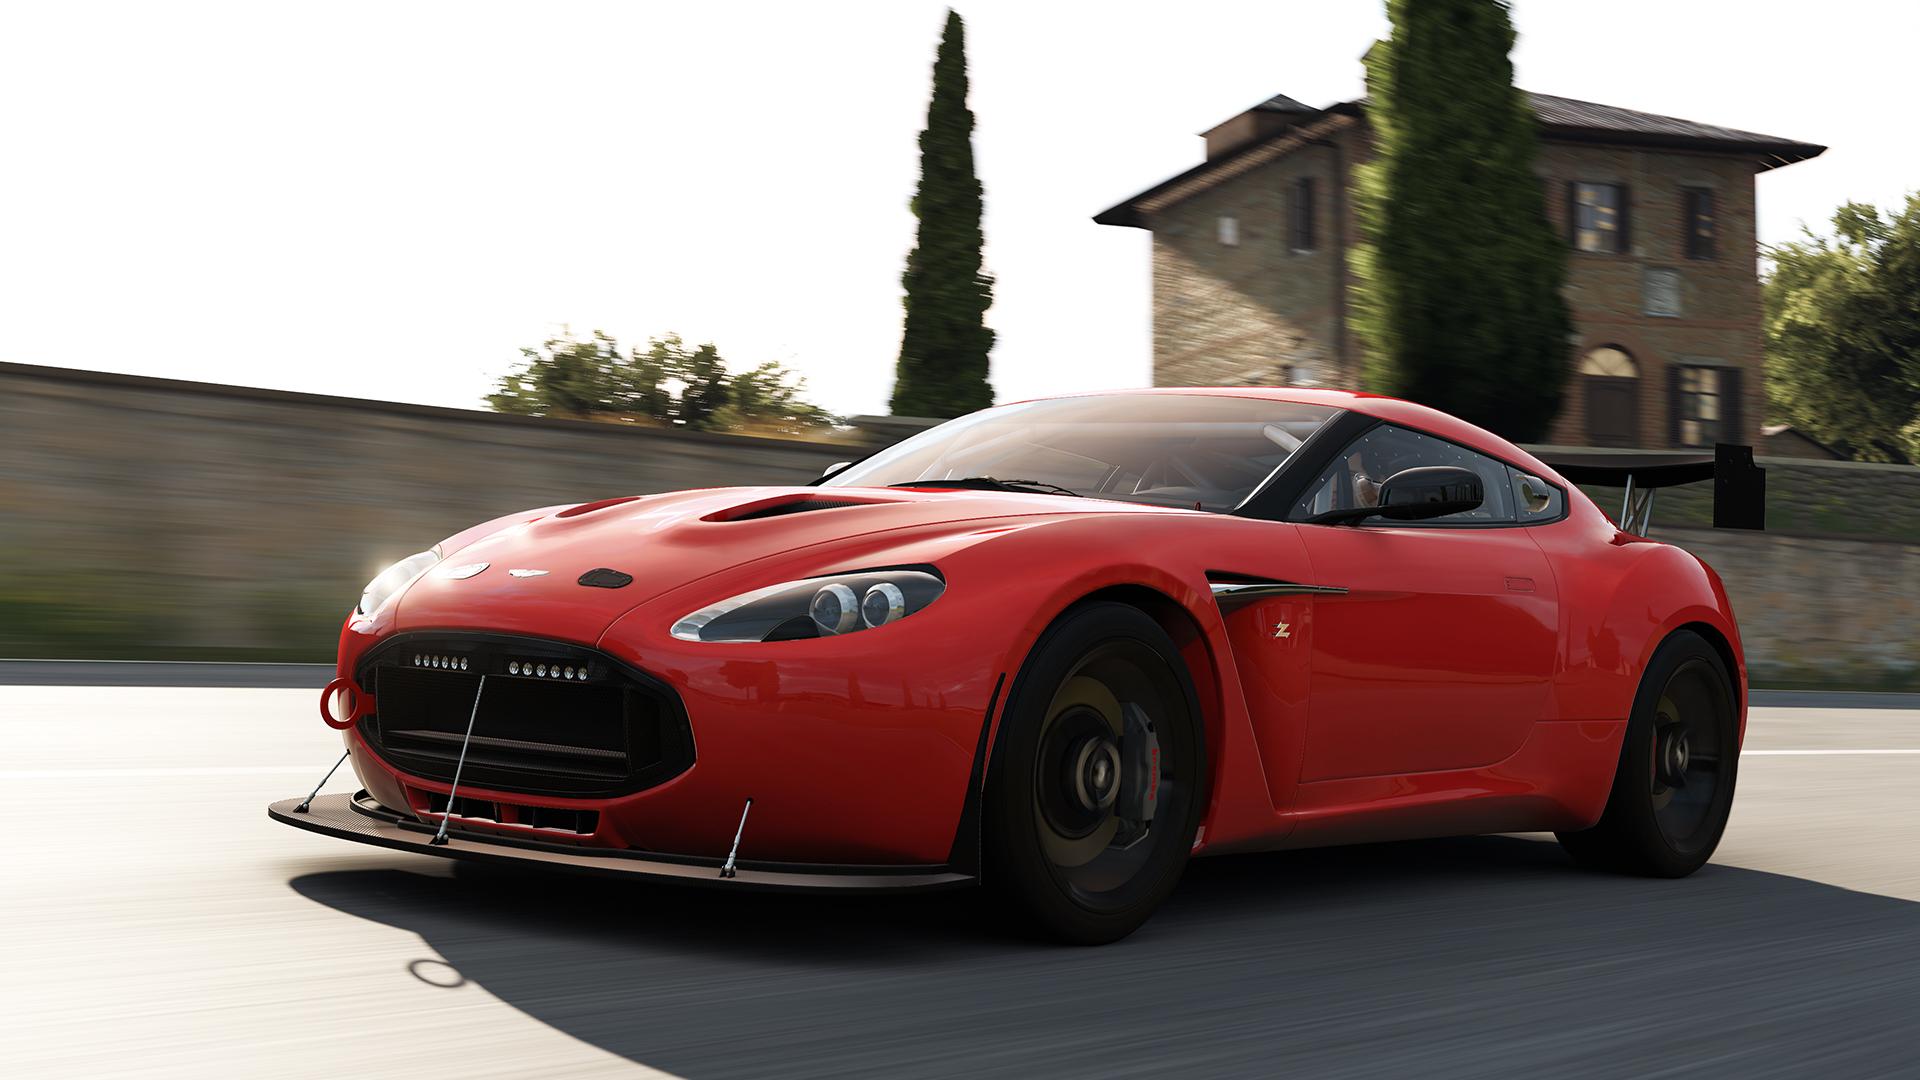 Forza Horizon 2 2011 Aston Martin V12 Zagato (Villa d'Este)